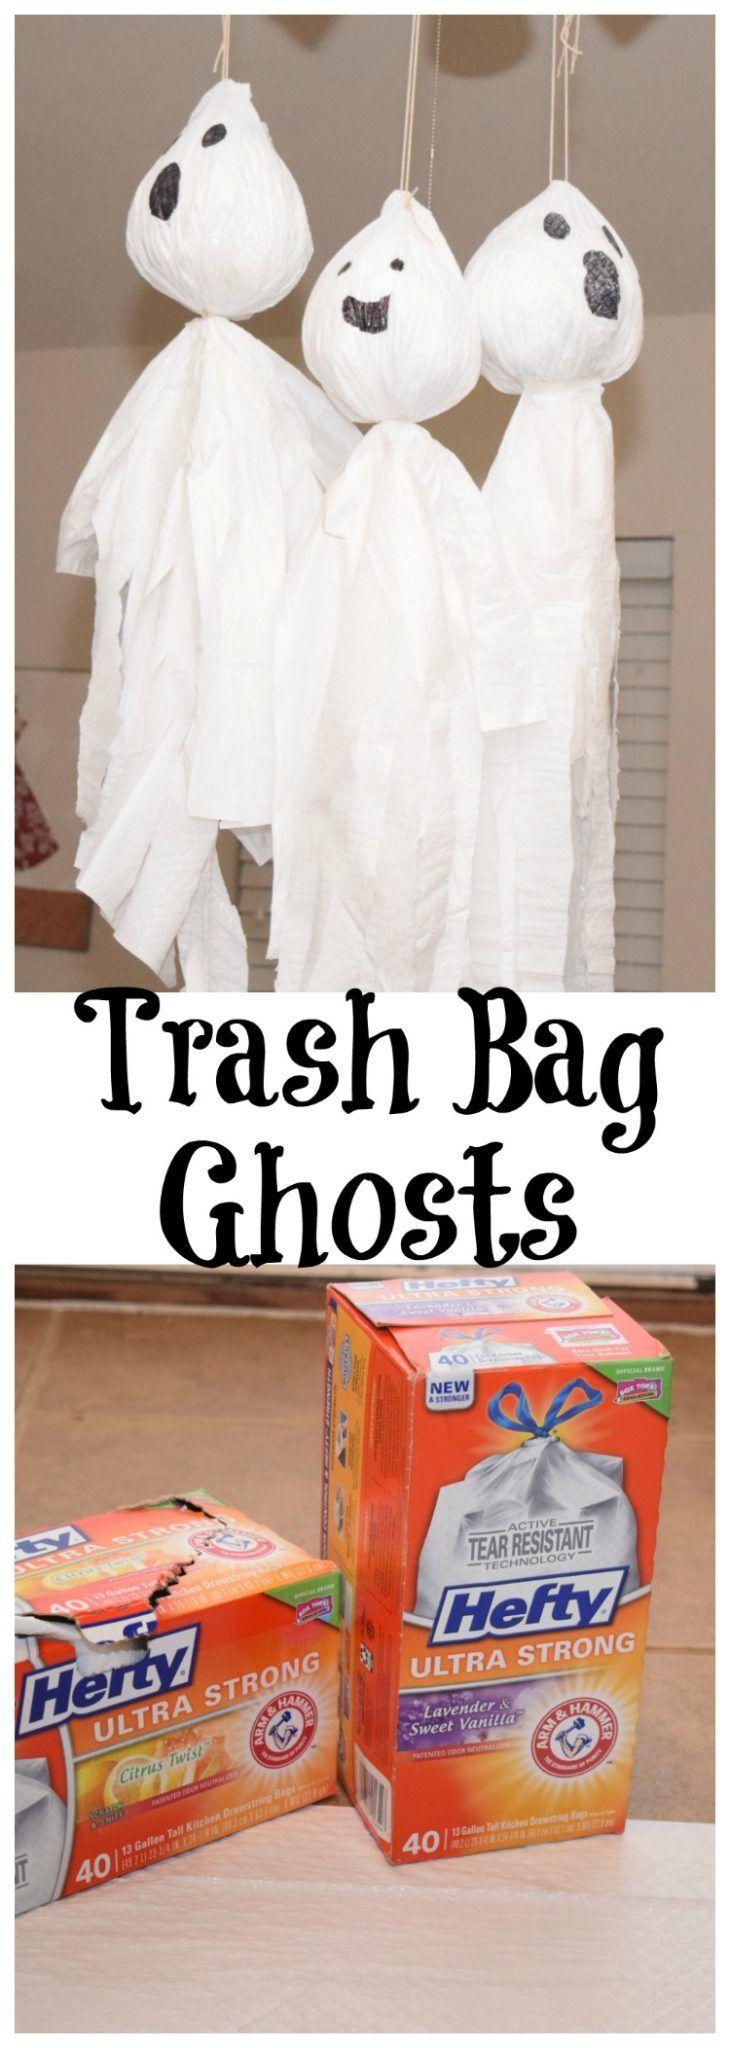 DIY easy Trash Bag Ghosts for Halloween!  $1 off coupon https://ooh.li/cb10253  #AD #HeftyHeftyHefty #HeftyHelper